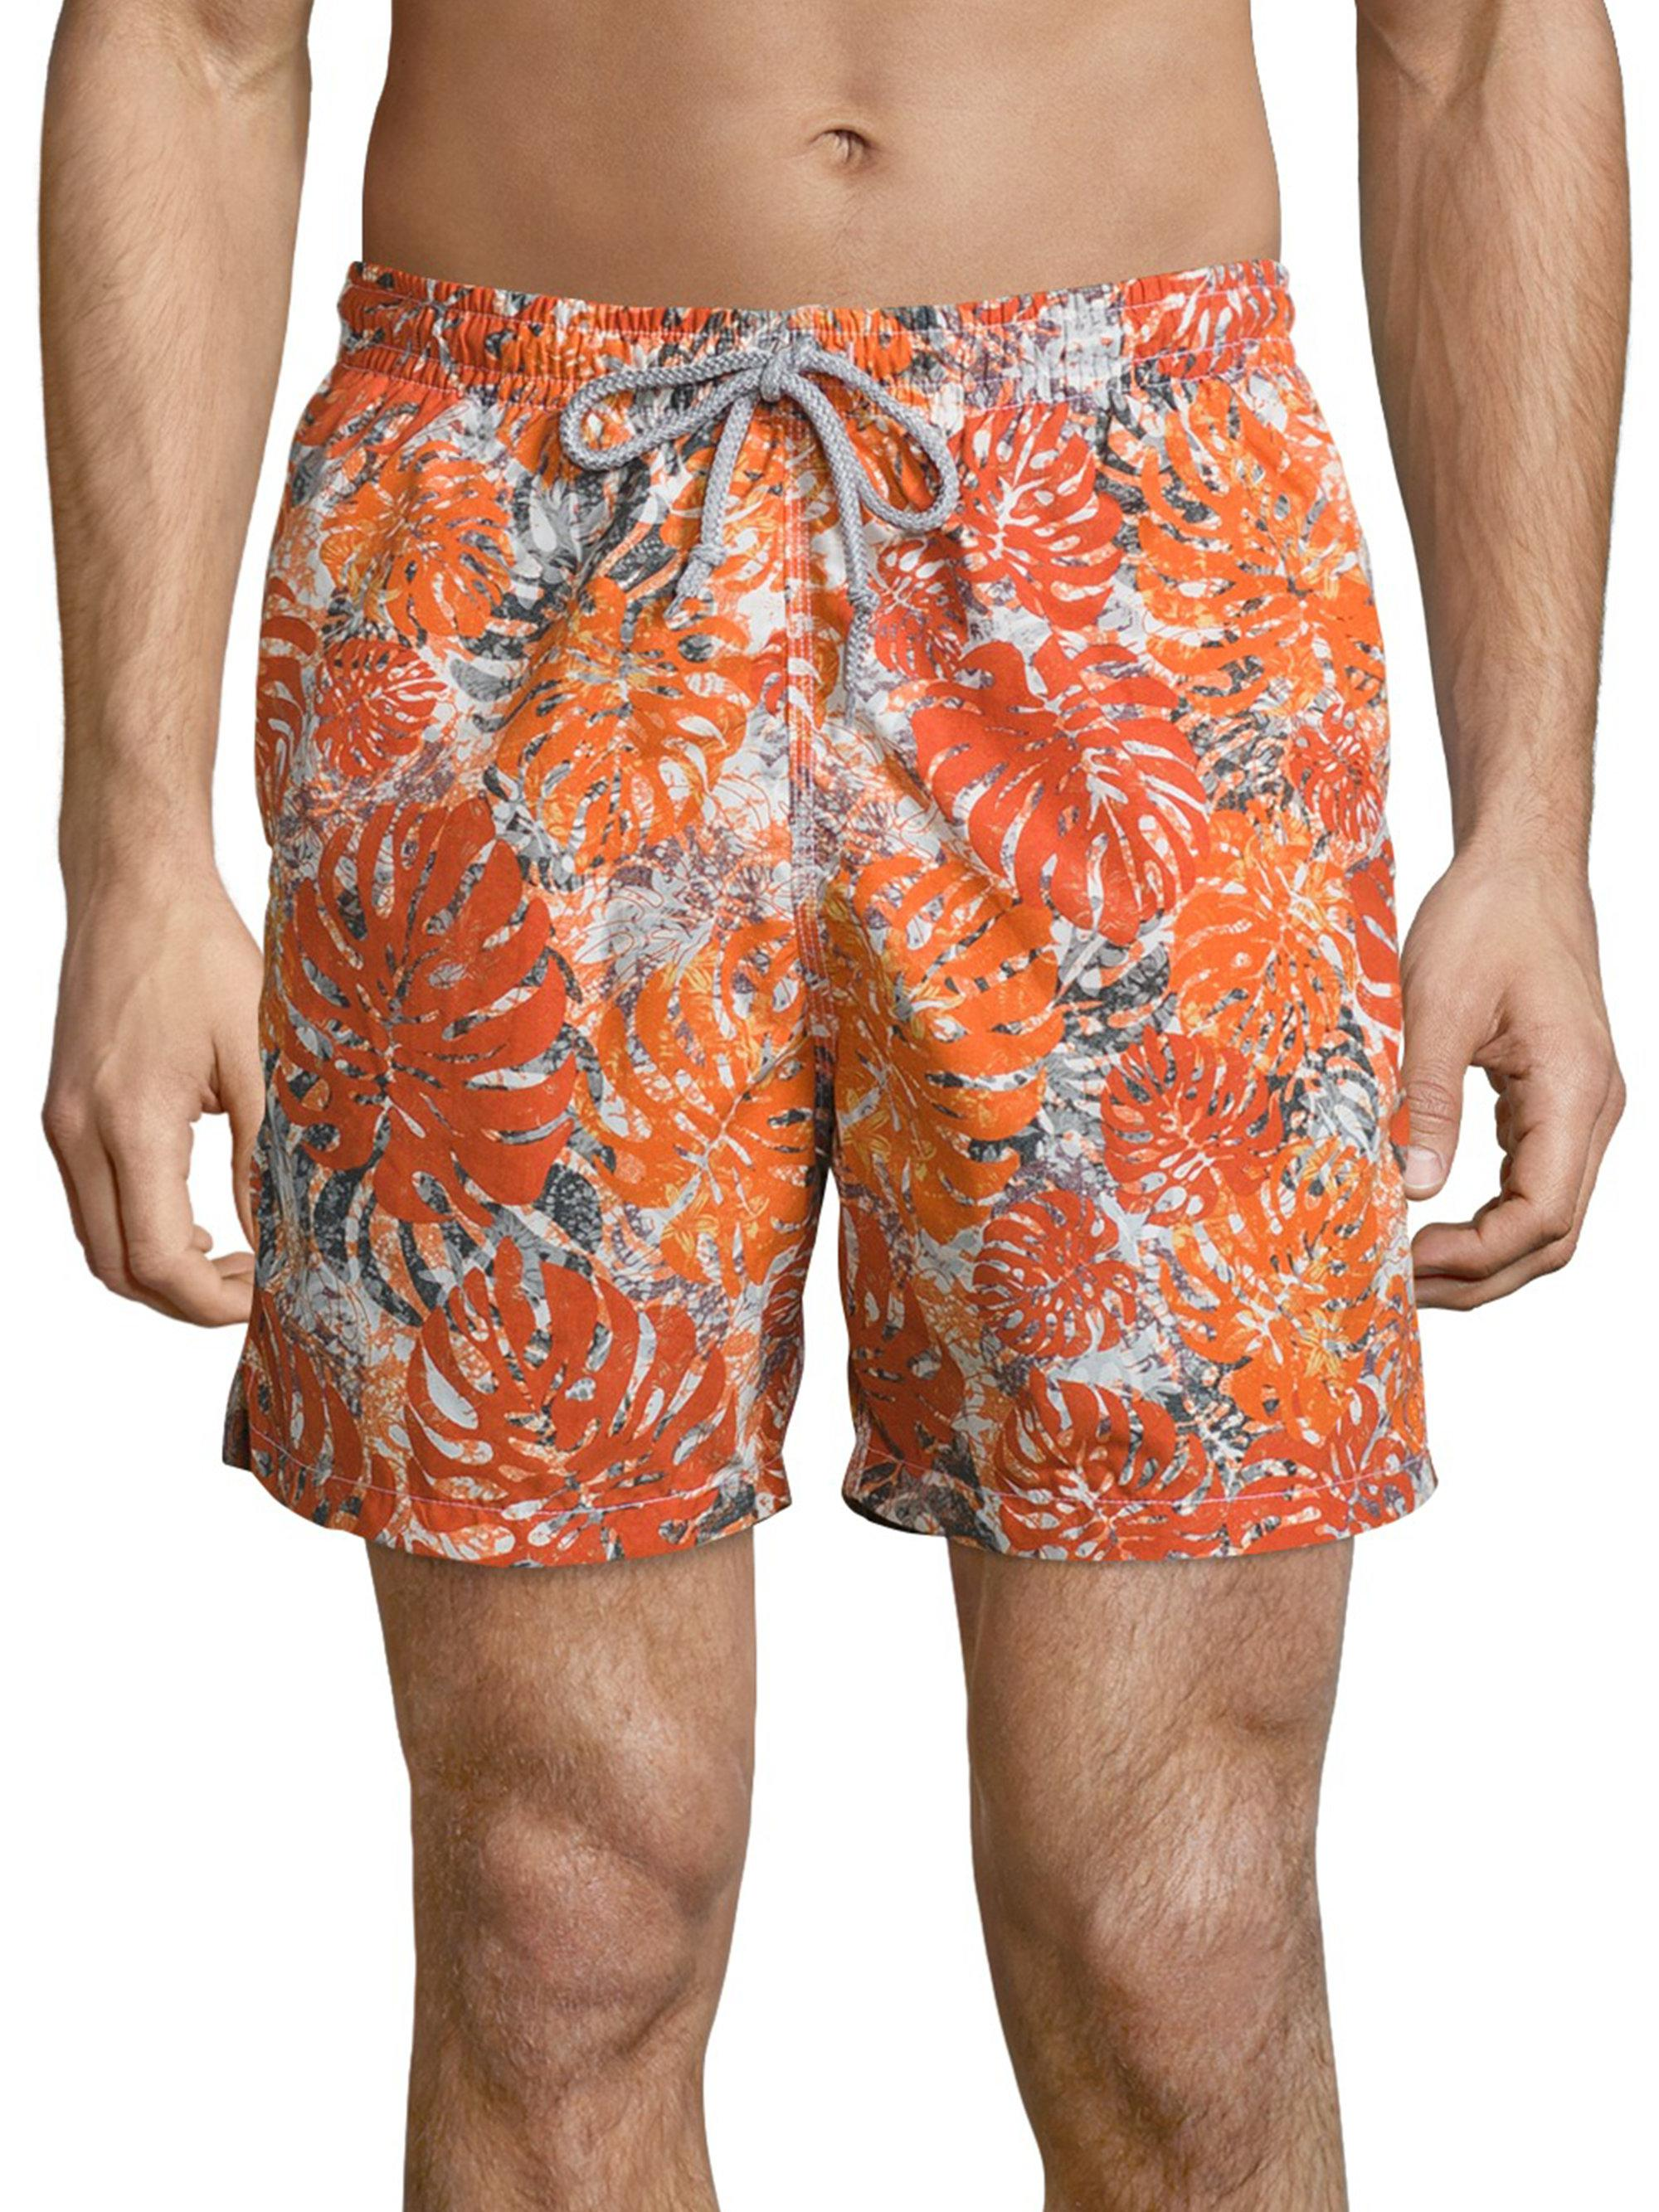 Saks Fifth Avenue. Men's Orange Palm Leaf Camo Printed Swim Shorts